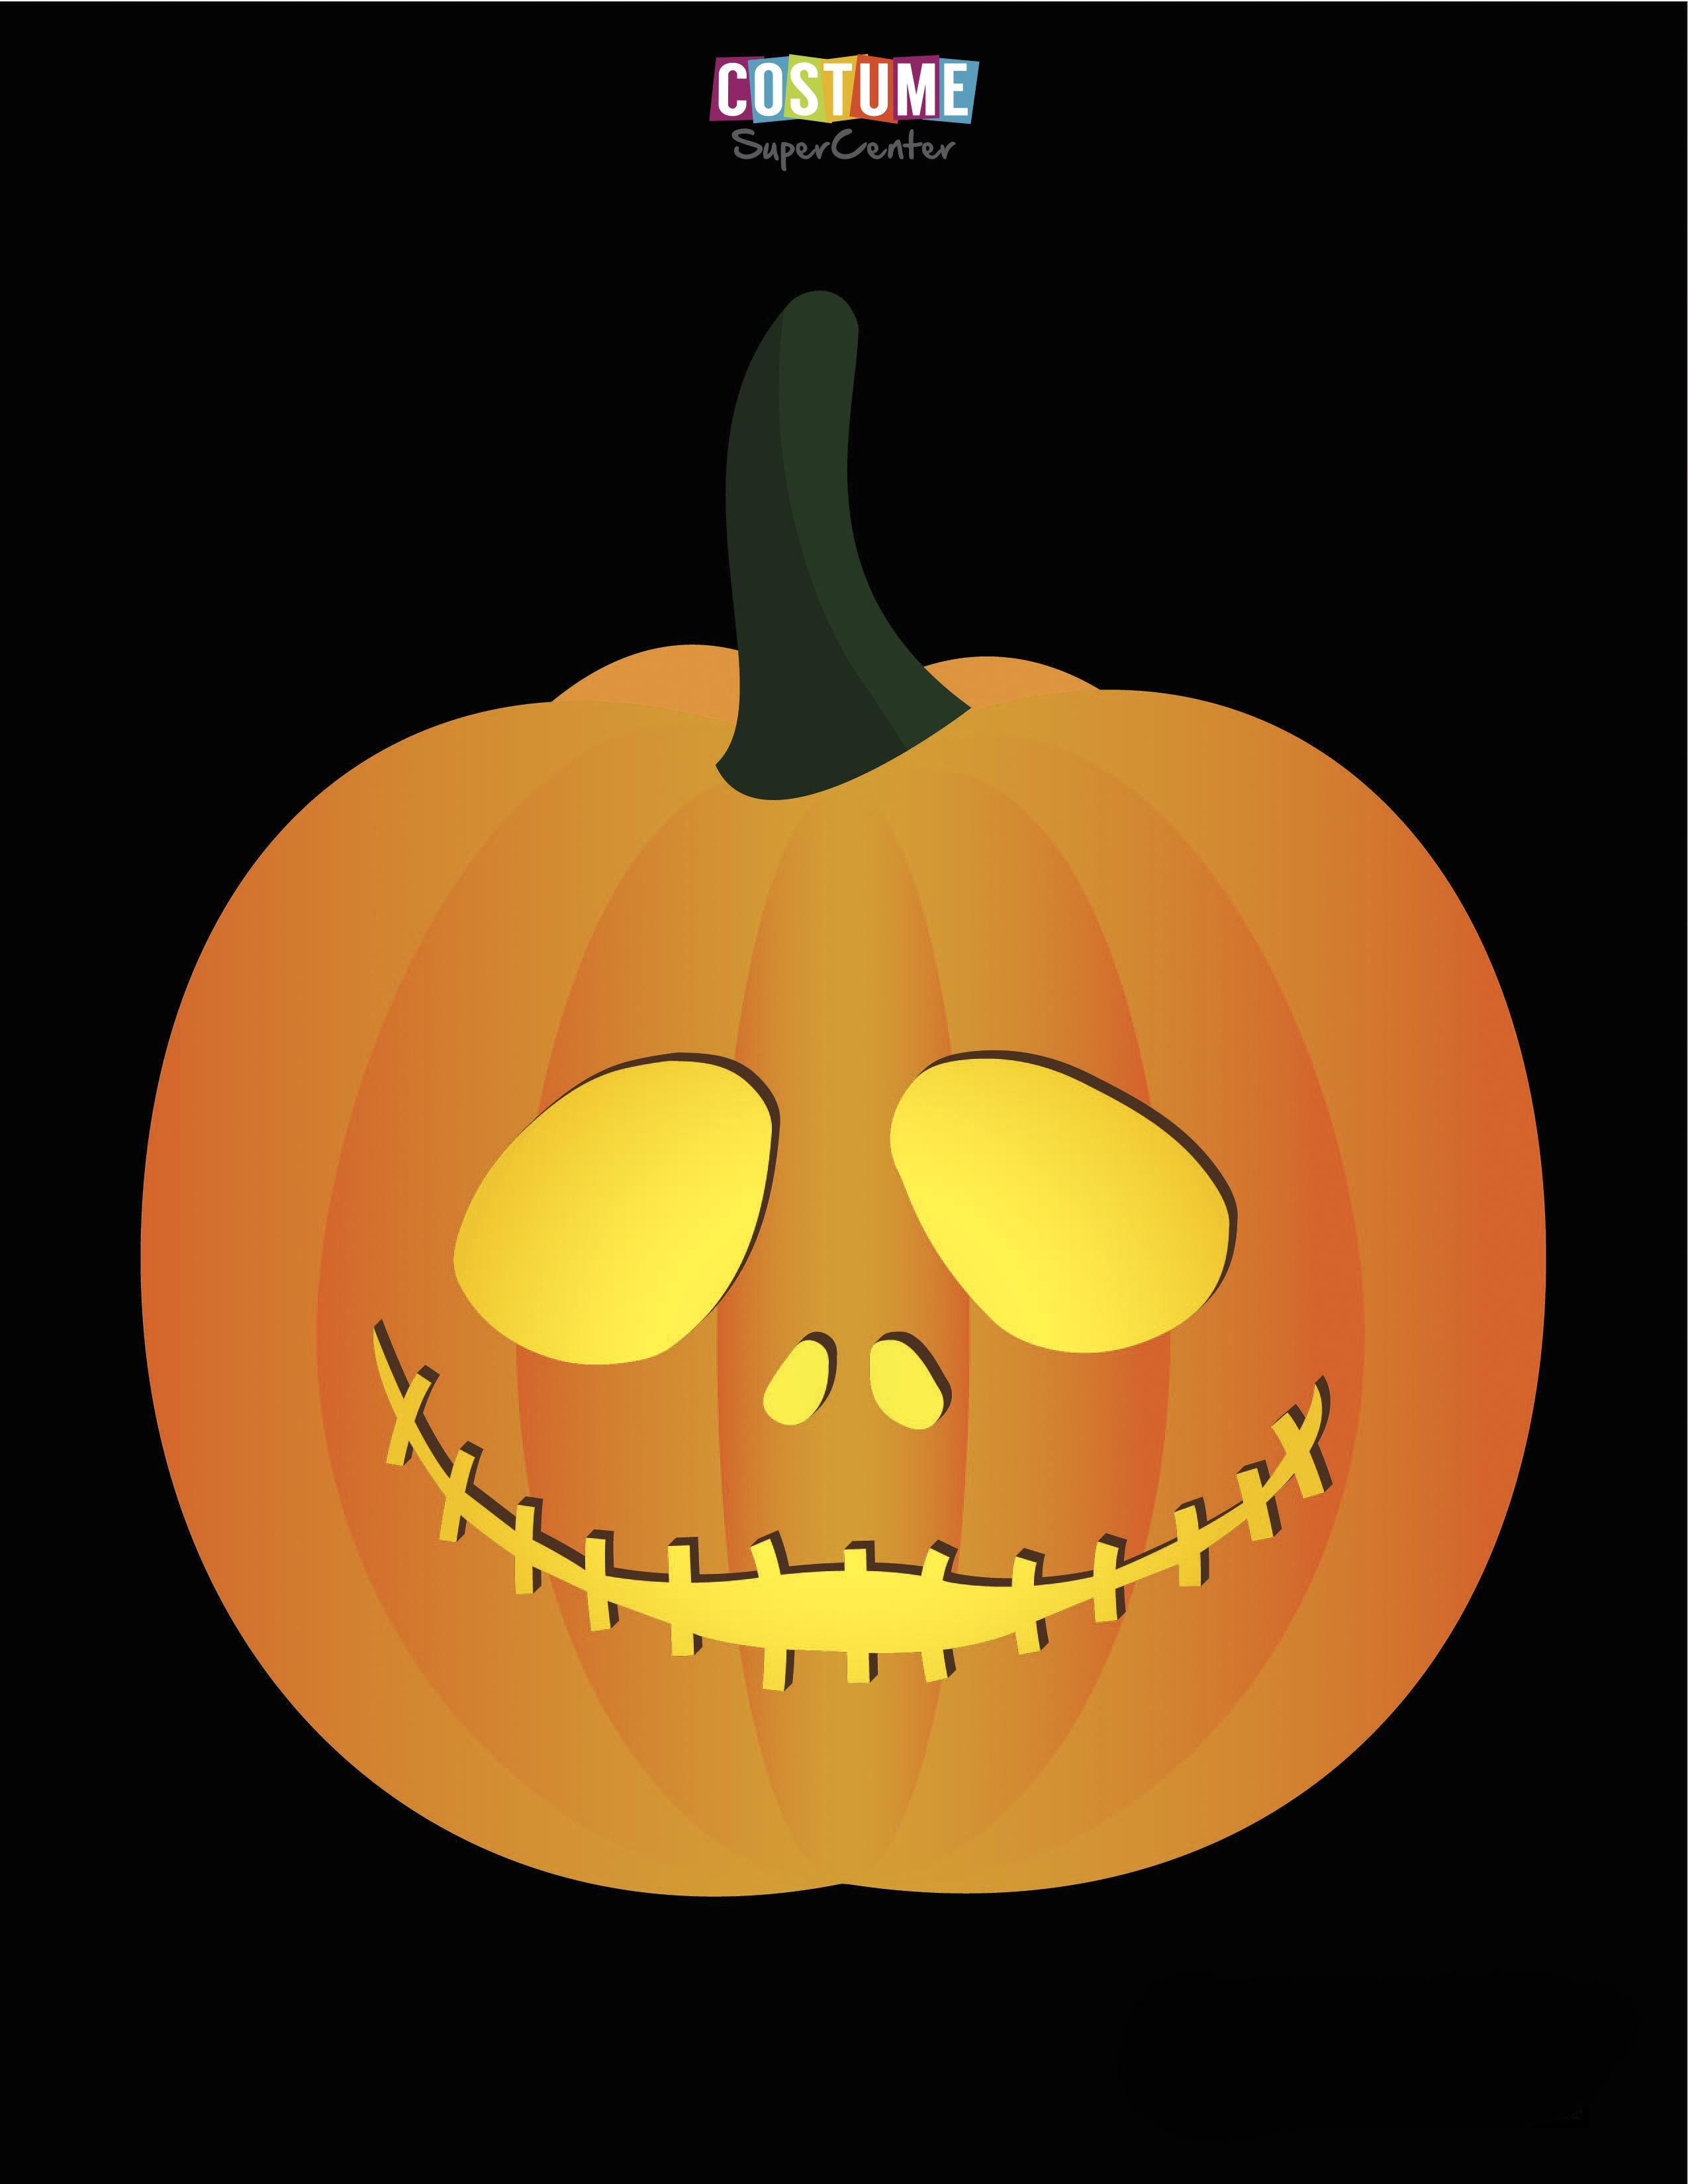 Nightmare Before Christmas Pumpkin Carving Stencils | Costume - Jack Skellington And Sally Pumpkin Stencils Free Printable